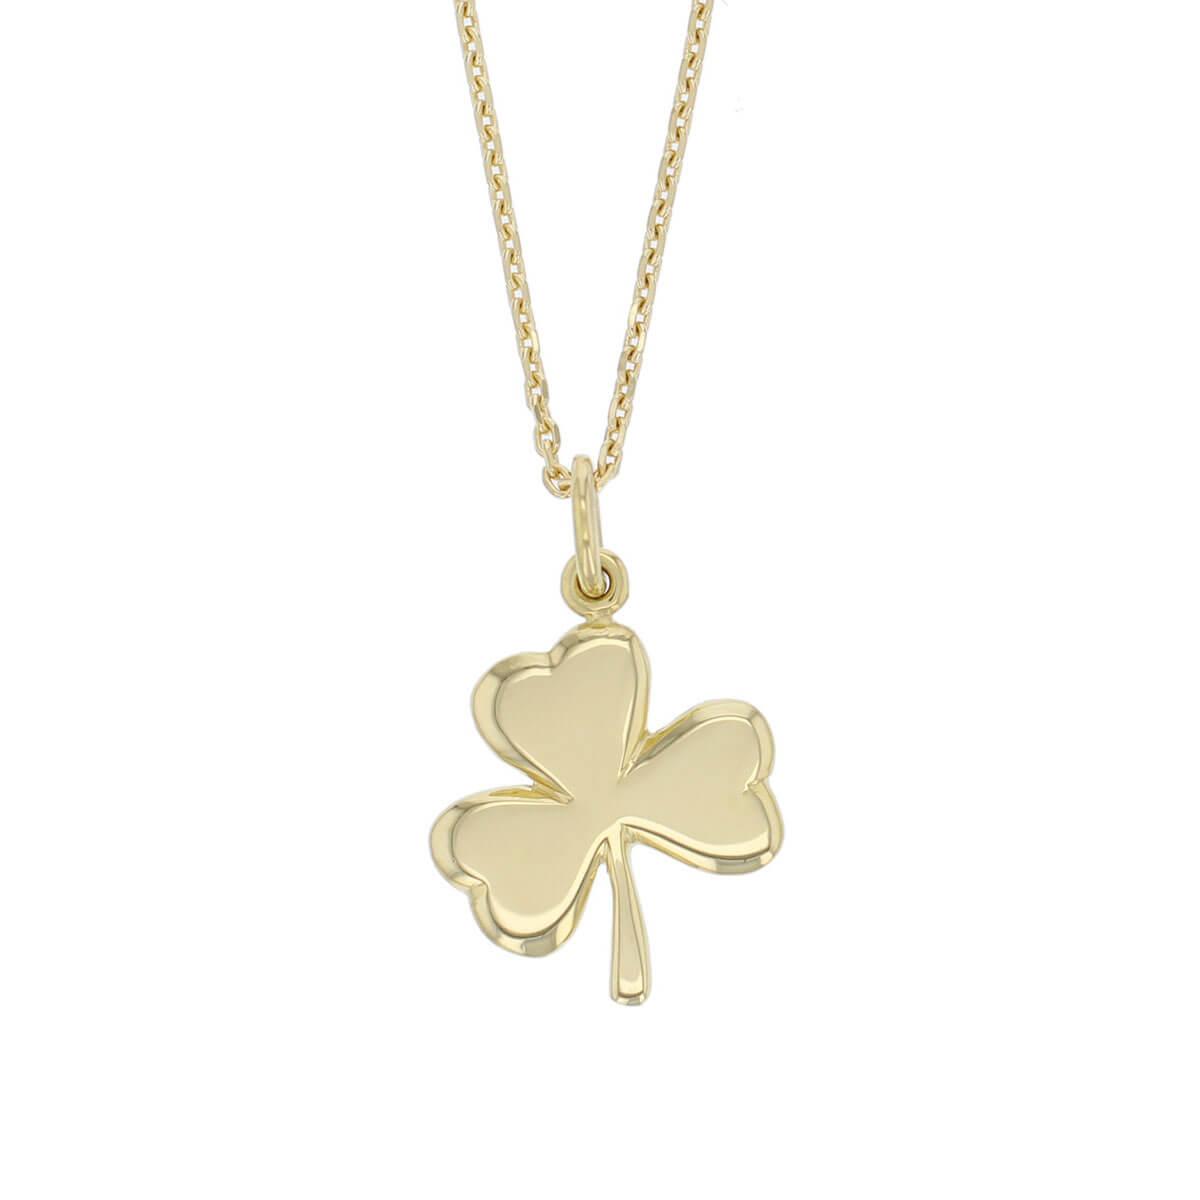 18ct yellow gold shamrock pendant, symbol of St. Patrick, holy trinity, Ireland, faith, hope, love, charm, designer handmade by Faller, Derry/ Londonderry, Irish hand crafted, clove